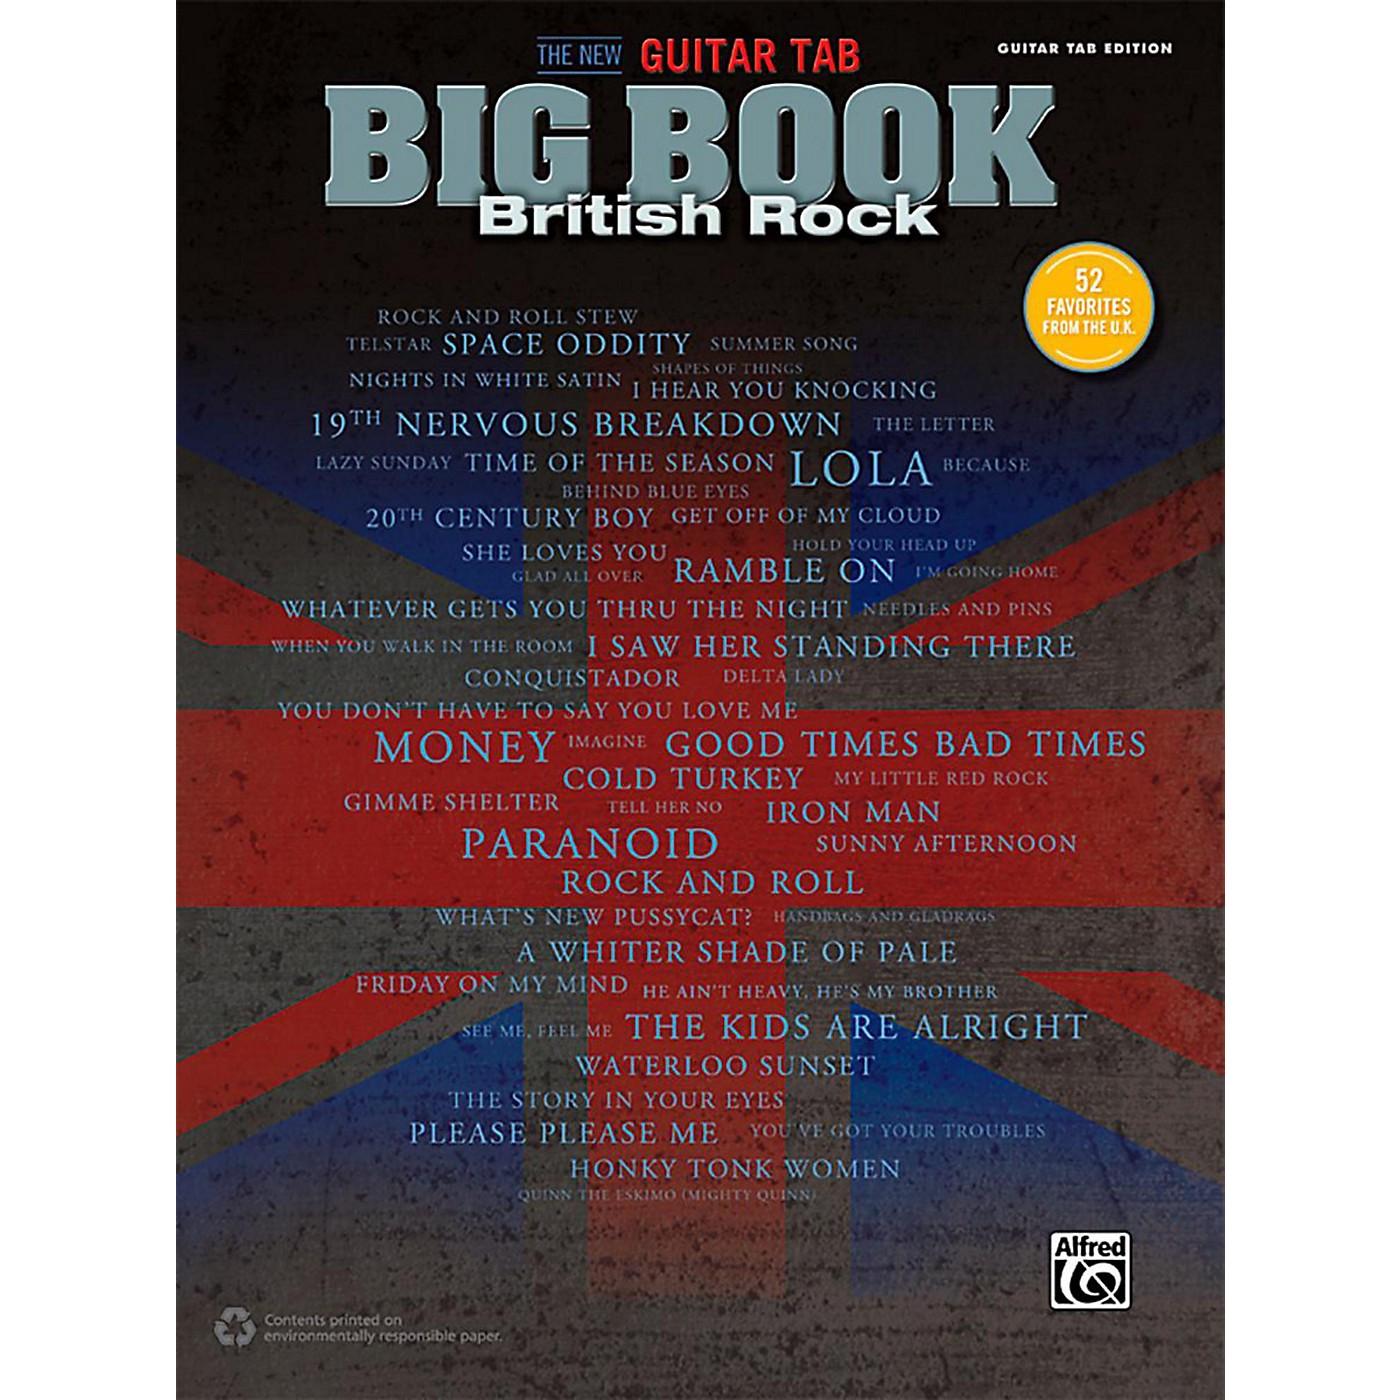 Alfred The New Guitar TAB Big Book British Rock thumbnail